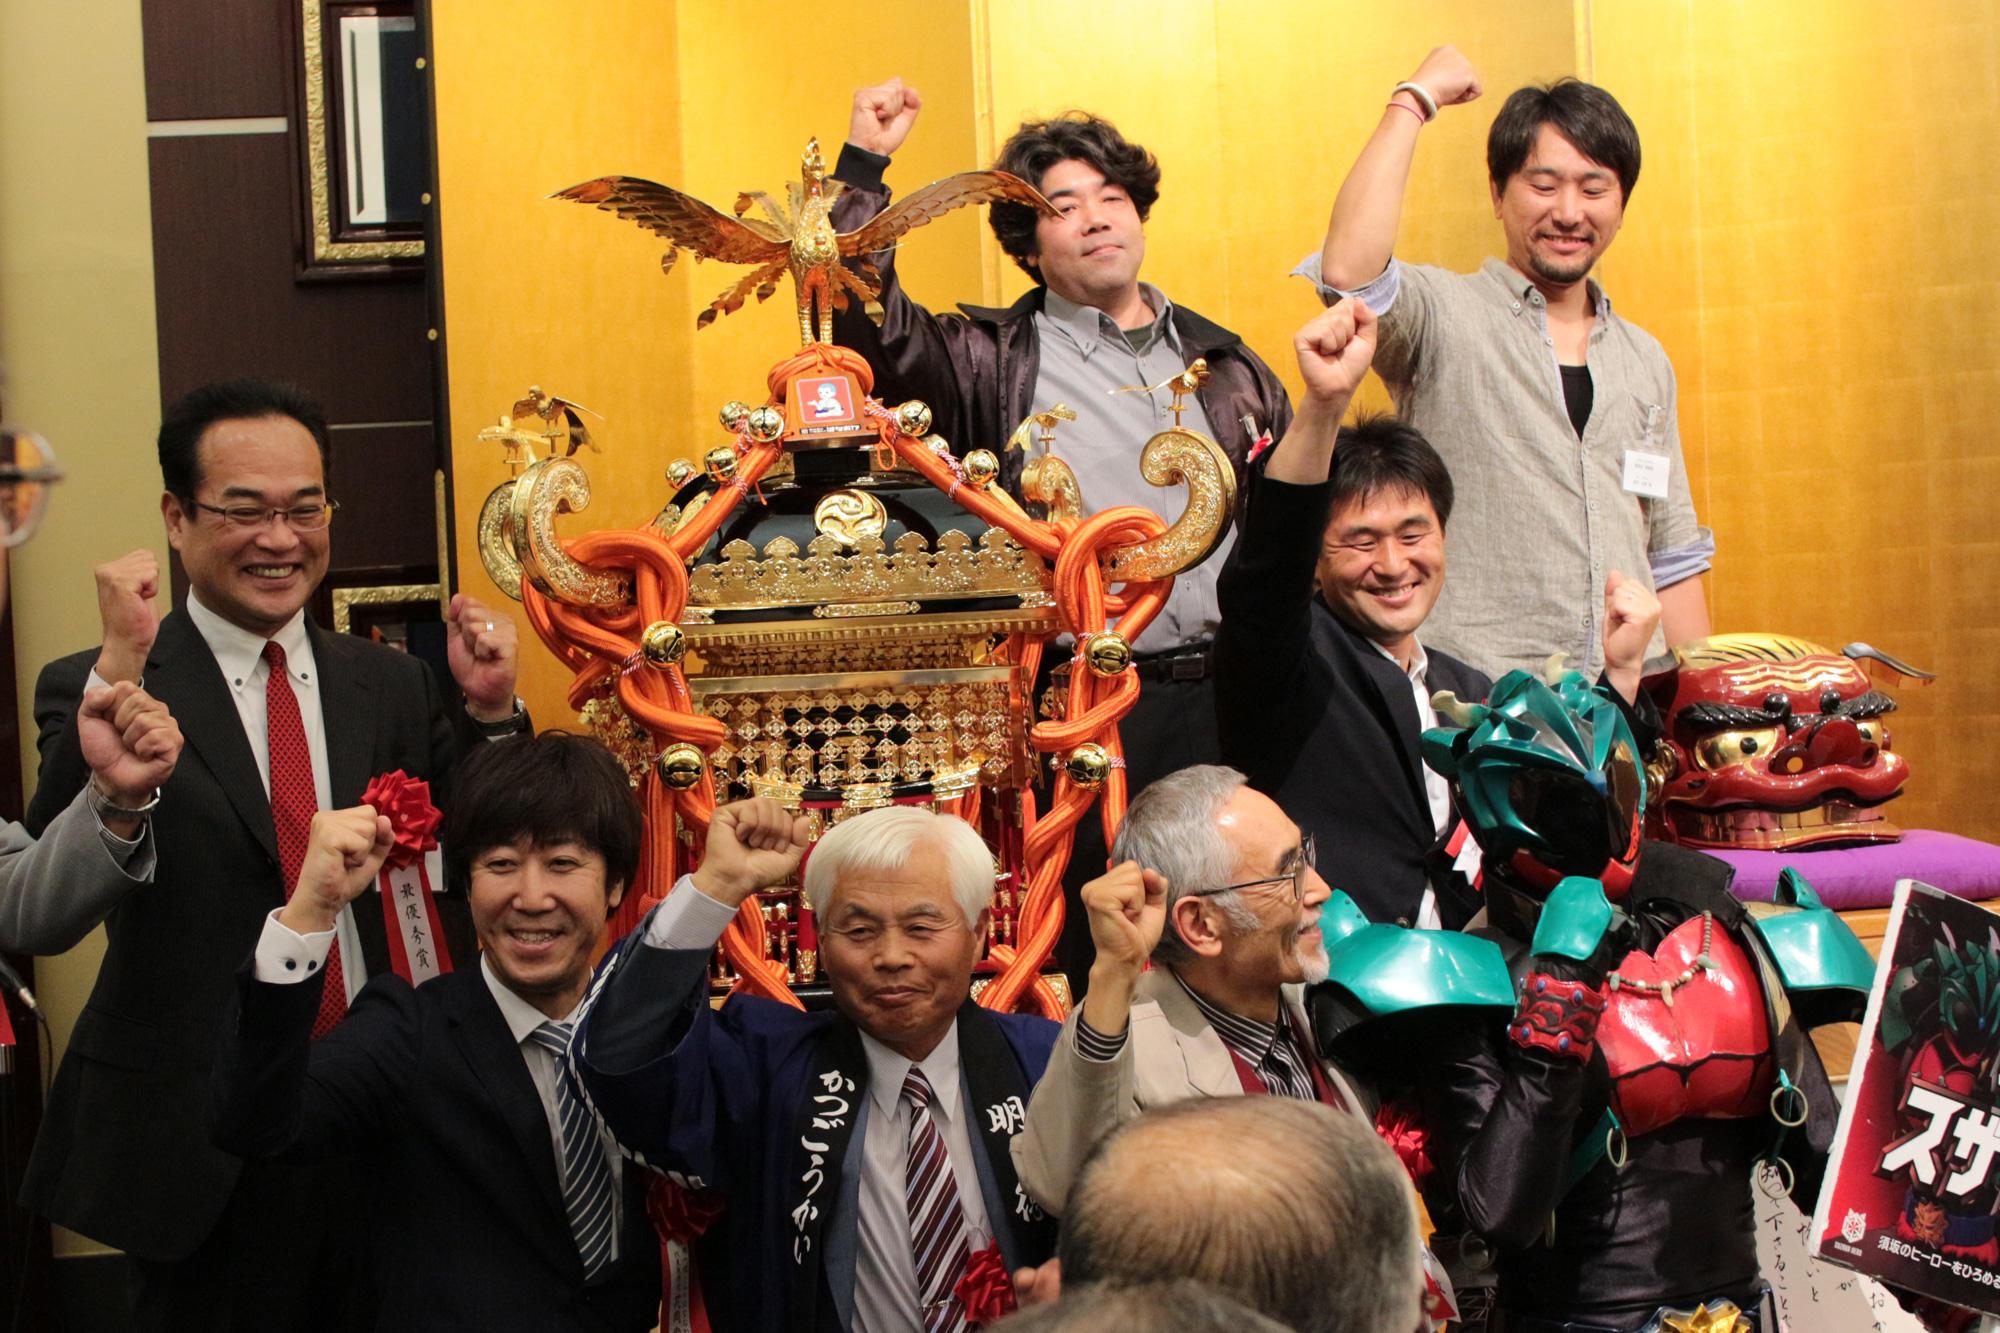 須坂市明徳町の皆様を囲み、記念撮影